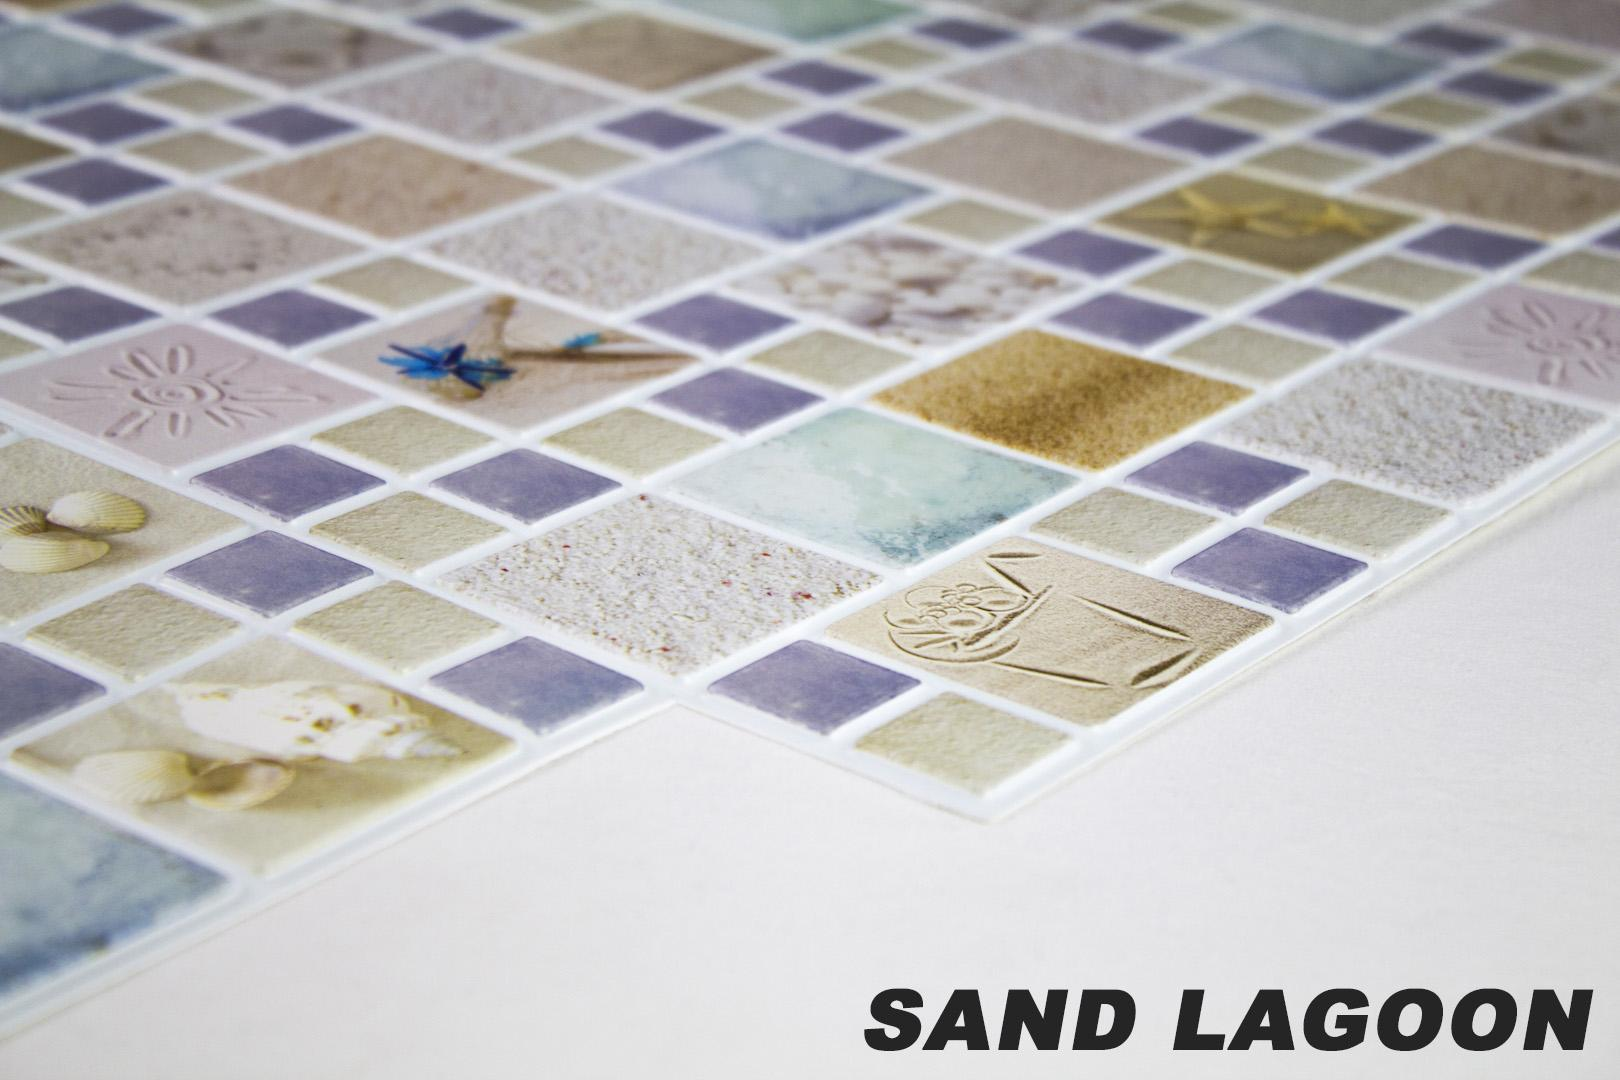 1 pvc dekorplatte mosaic wandverkleidung platten wand 95x48cm sand lagoon 4250819261642 ebay. Black Bedroom Furniture Sets. Home Design Ideas